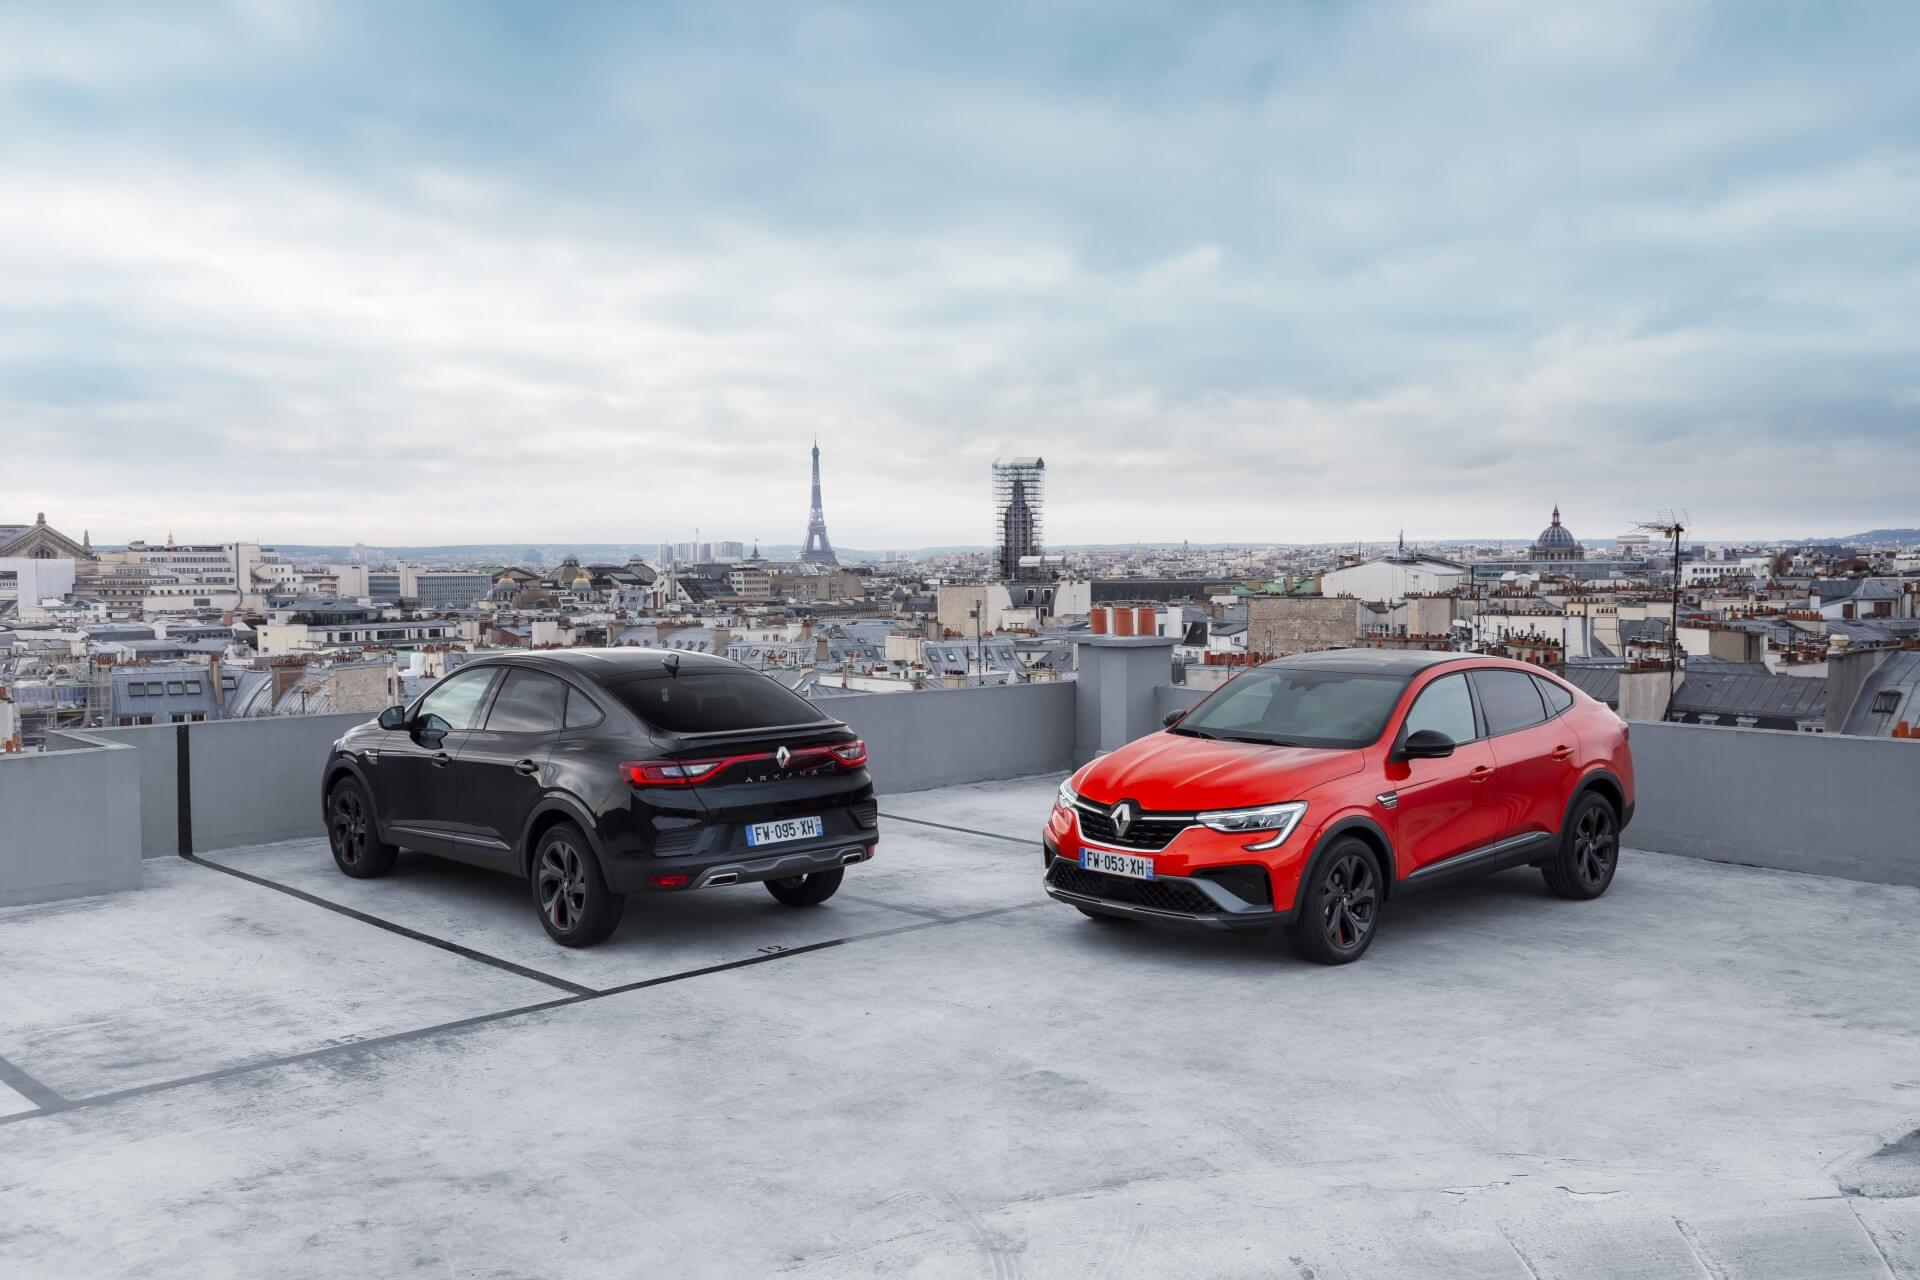 Carros Renault Arkana